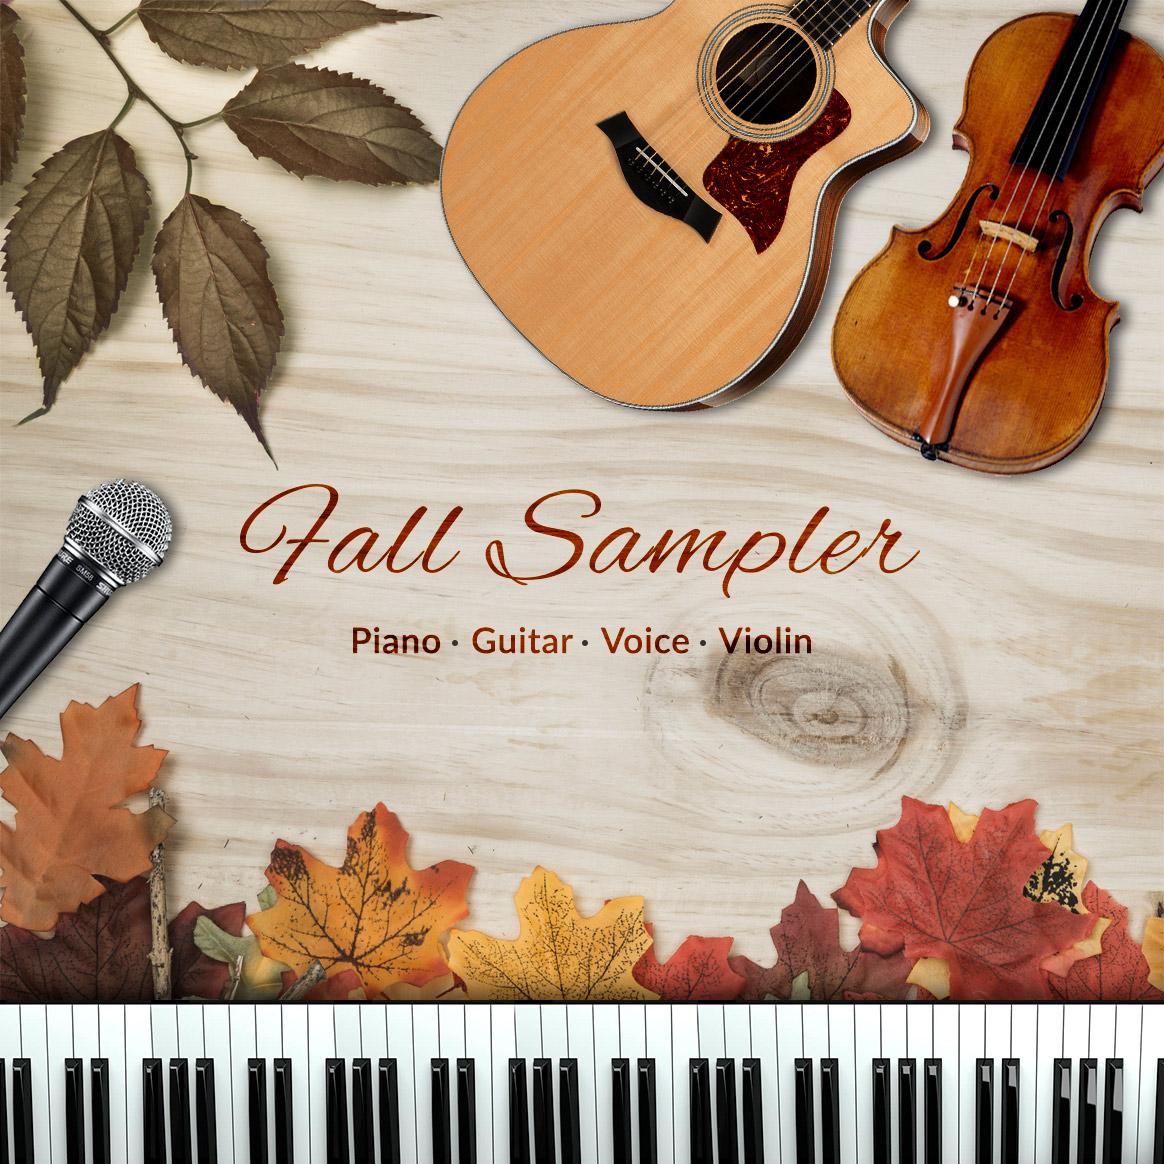 Piano, Guitar, Voice, Violin Fall Sampler Lessons